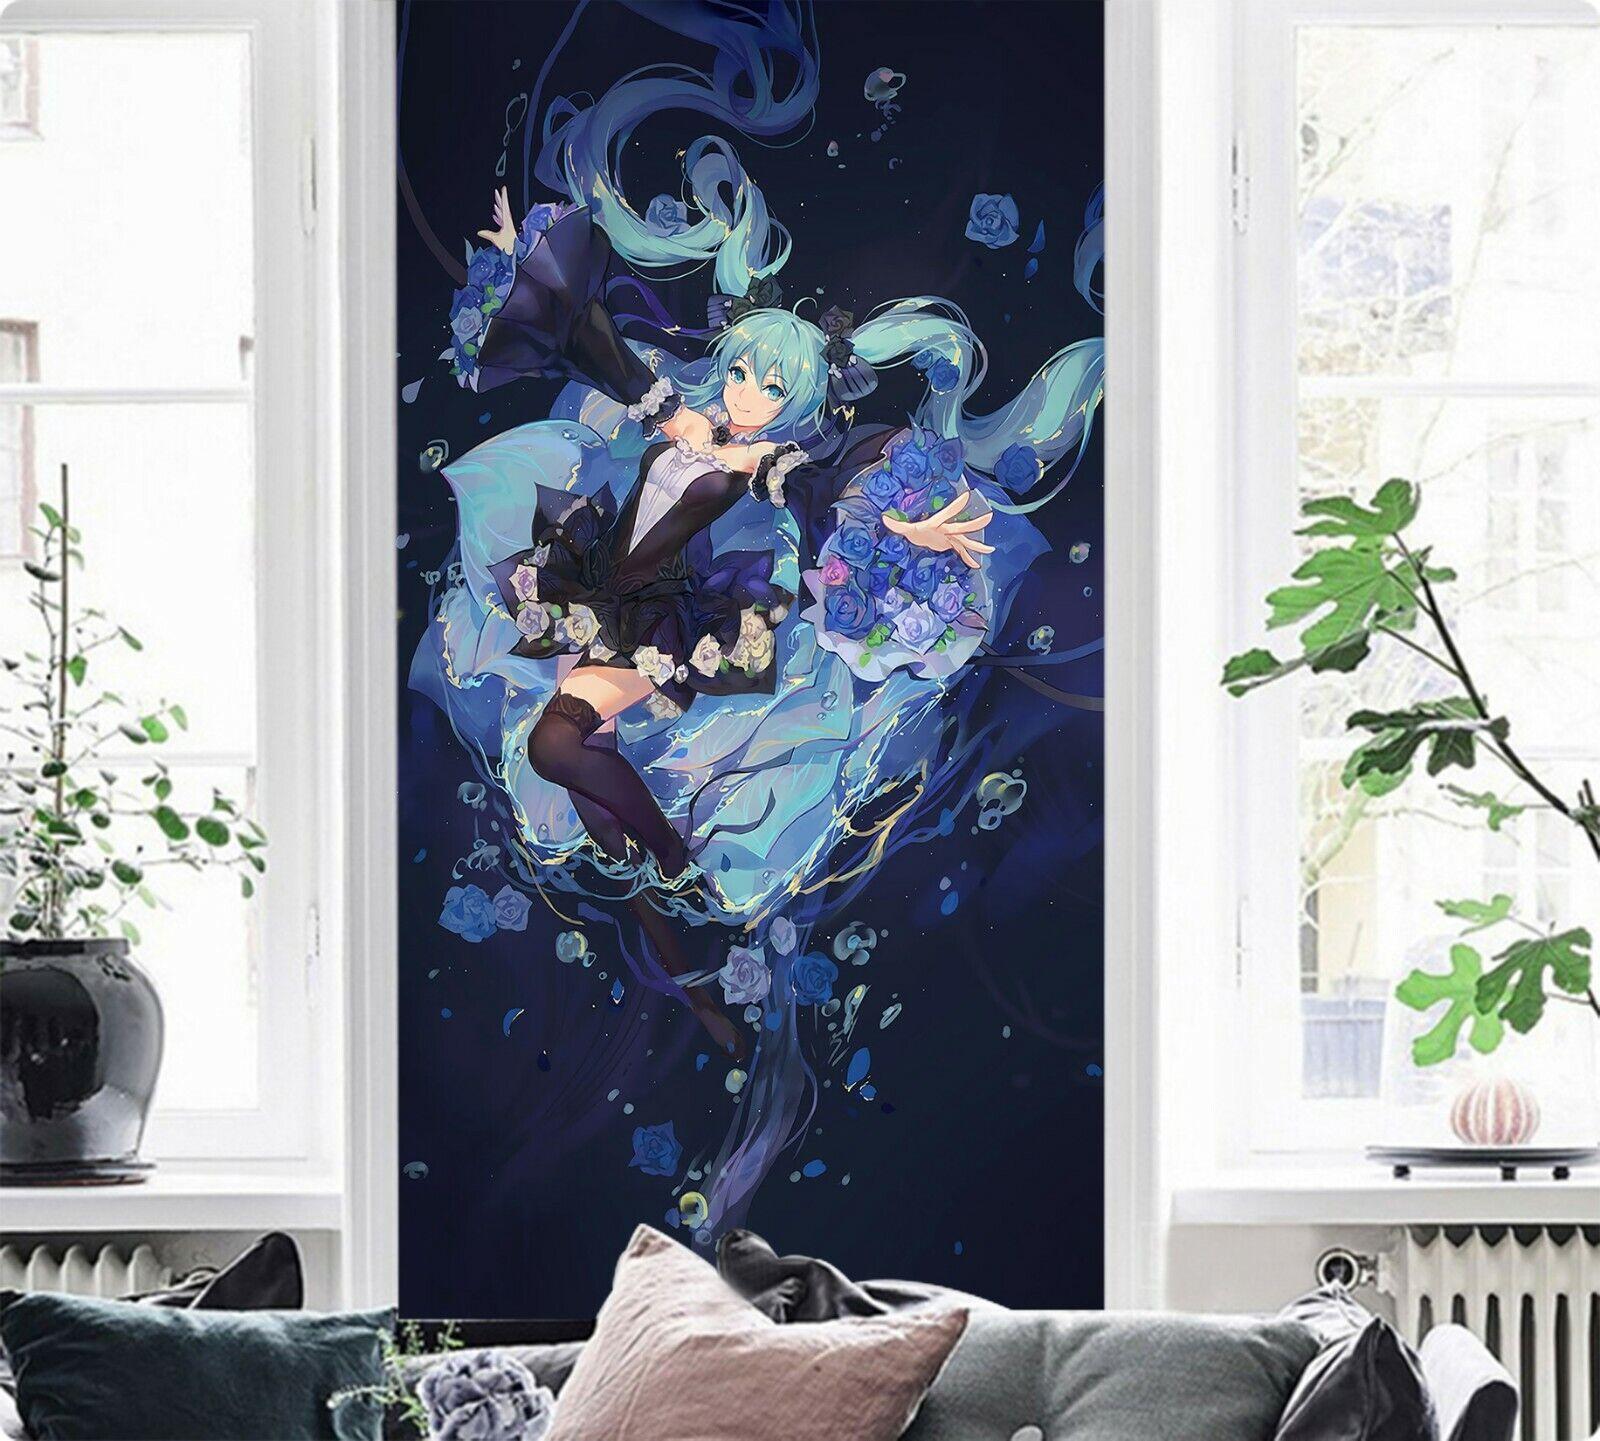 3D Hatsune Miku 229 Japan Anime Game Wallpaper Mural Poster Cartoon Cosplay US